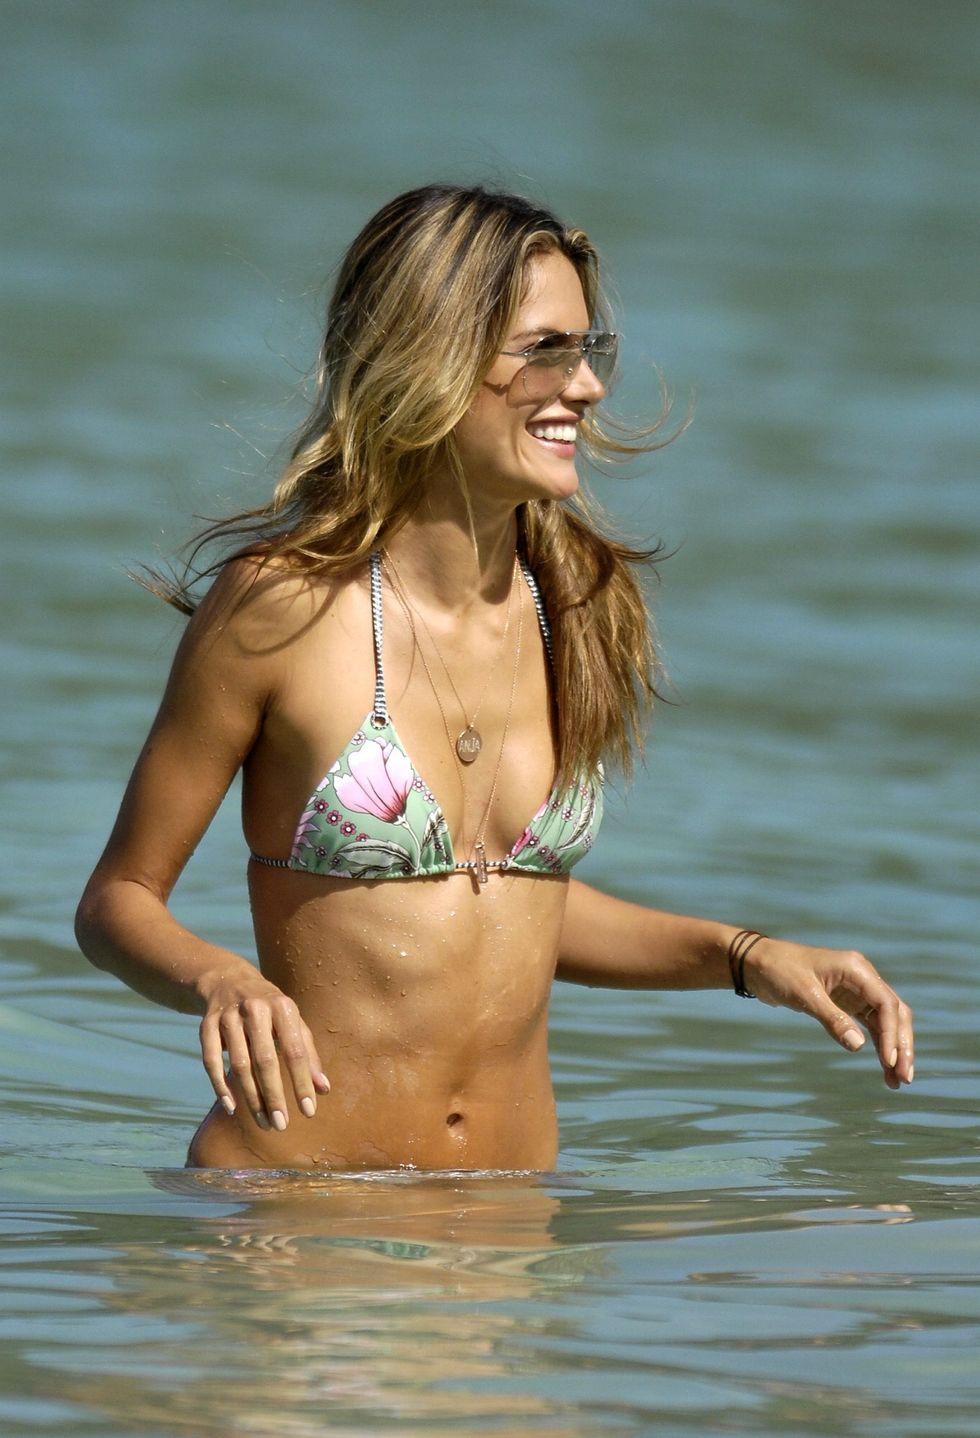 alessandra-ambrosio-in-bikini-on-a-beach-in-saint-barthelemy-03